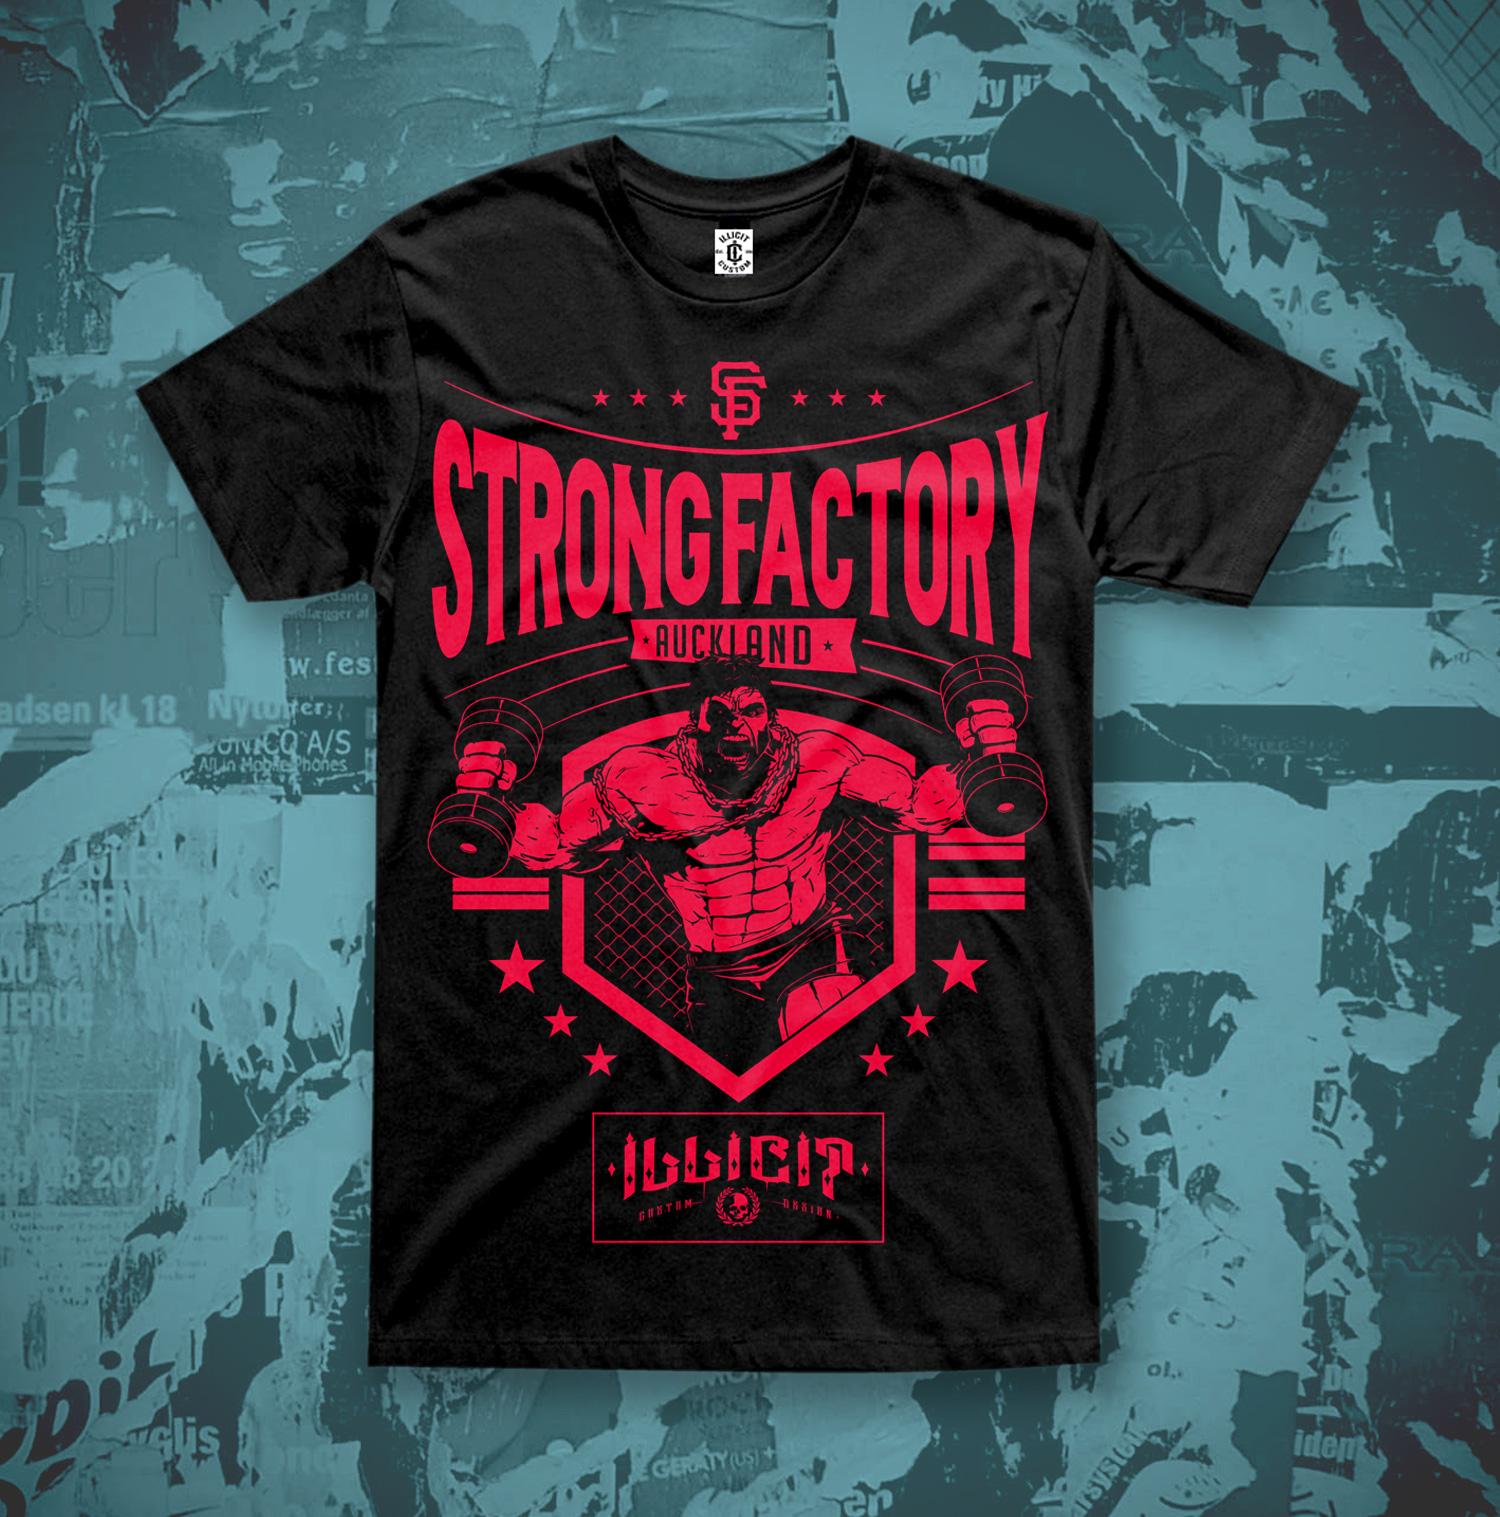 strongfactory.jpg